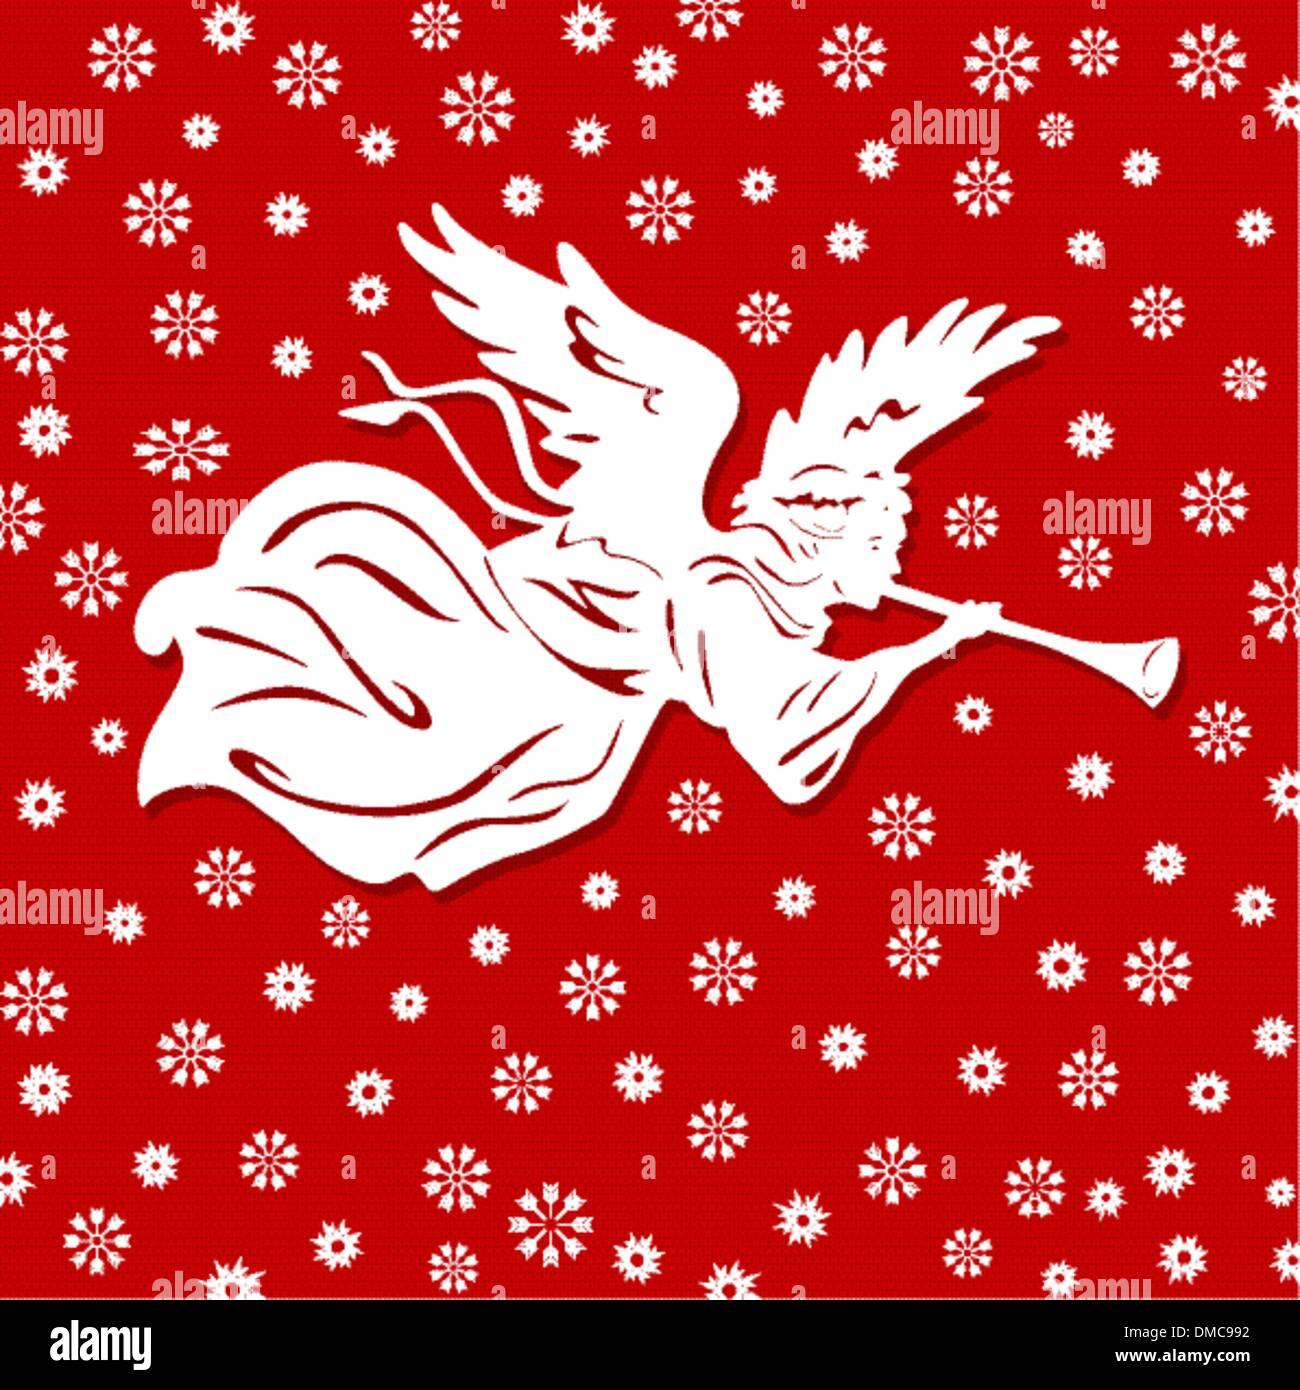 Christmas Angels - Stock Image